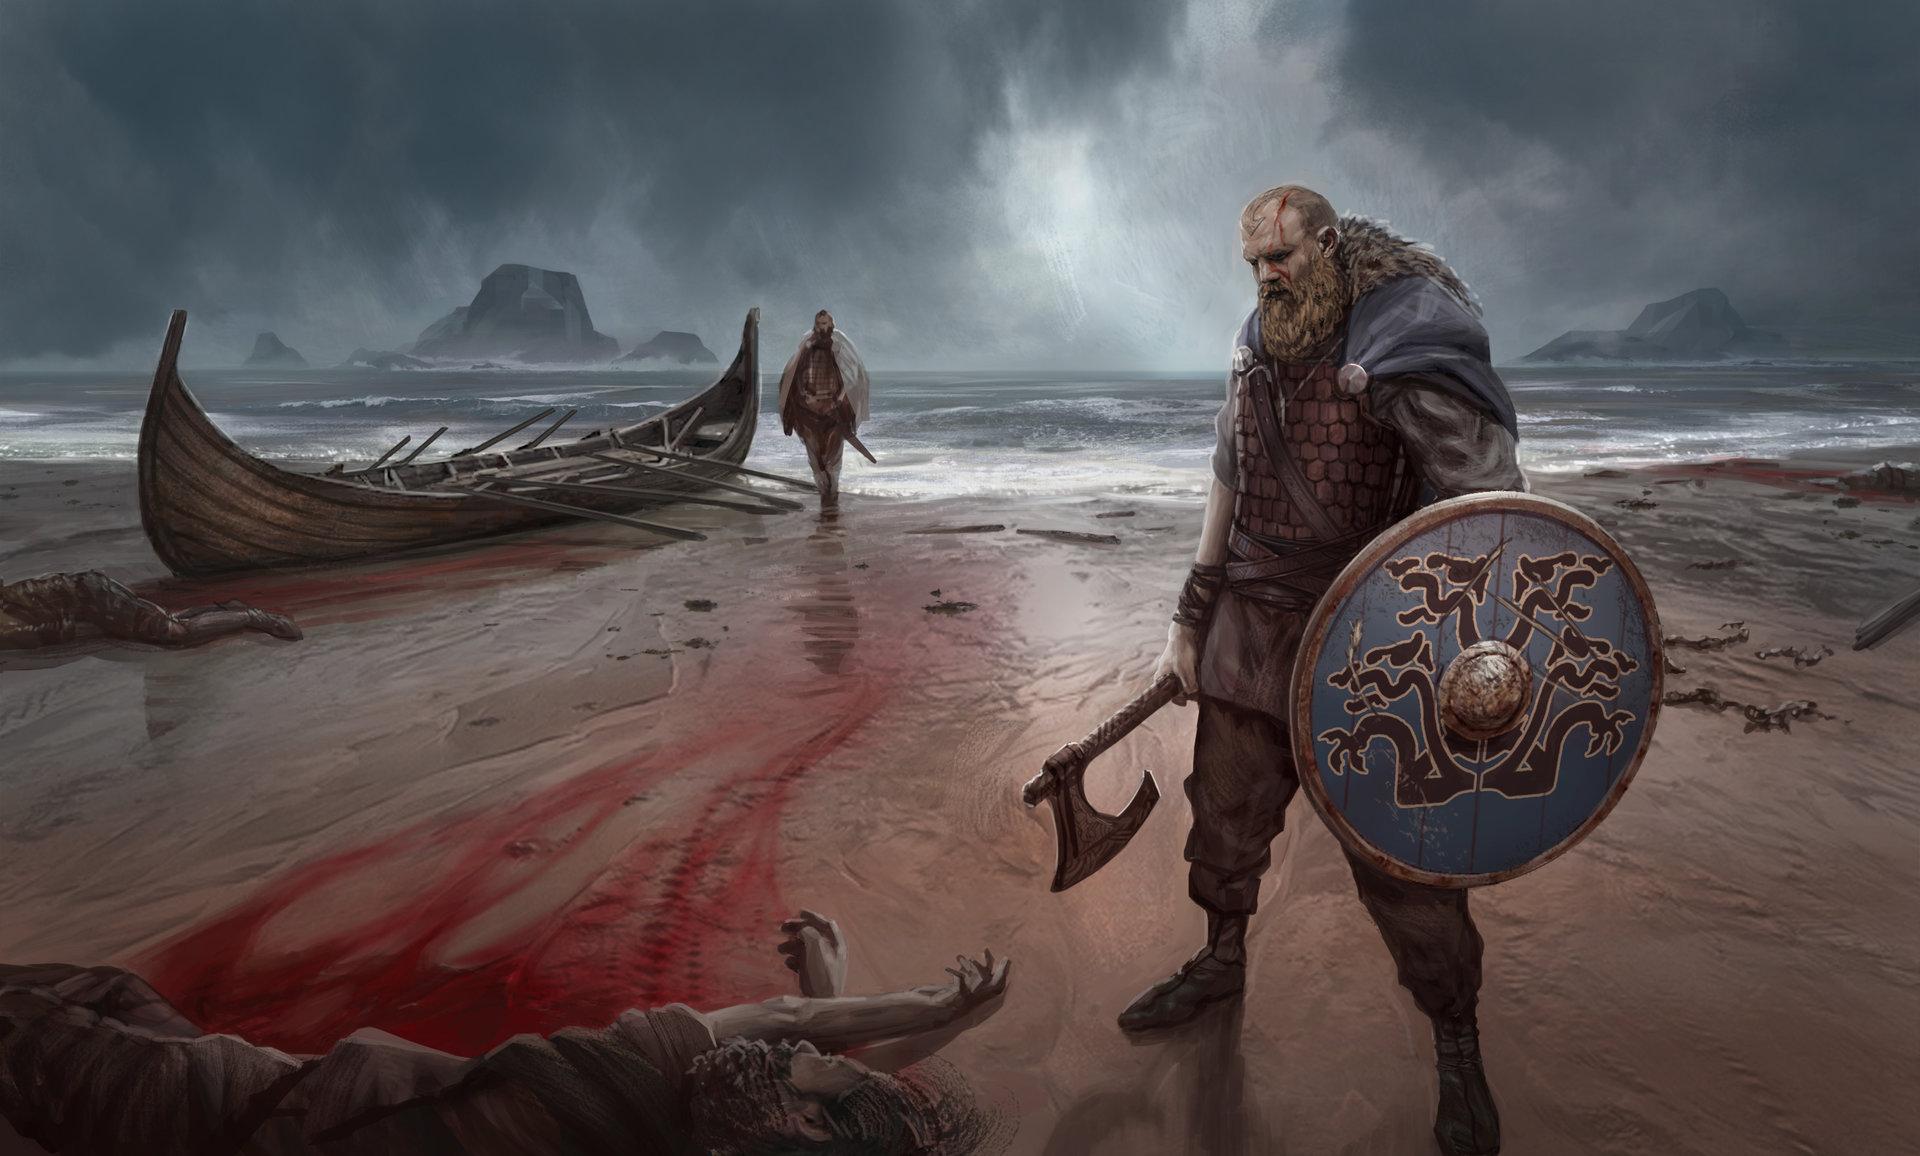 ArtStation - Viking Raiders, James Ives